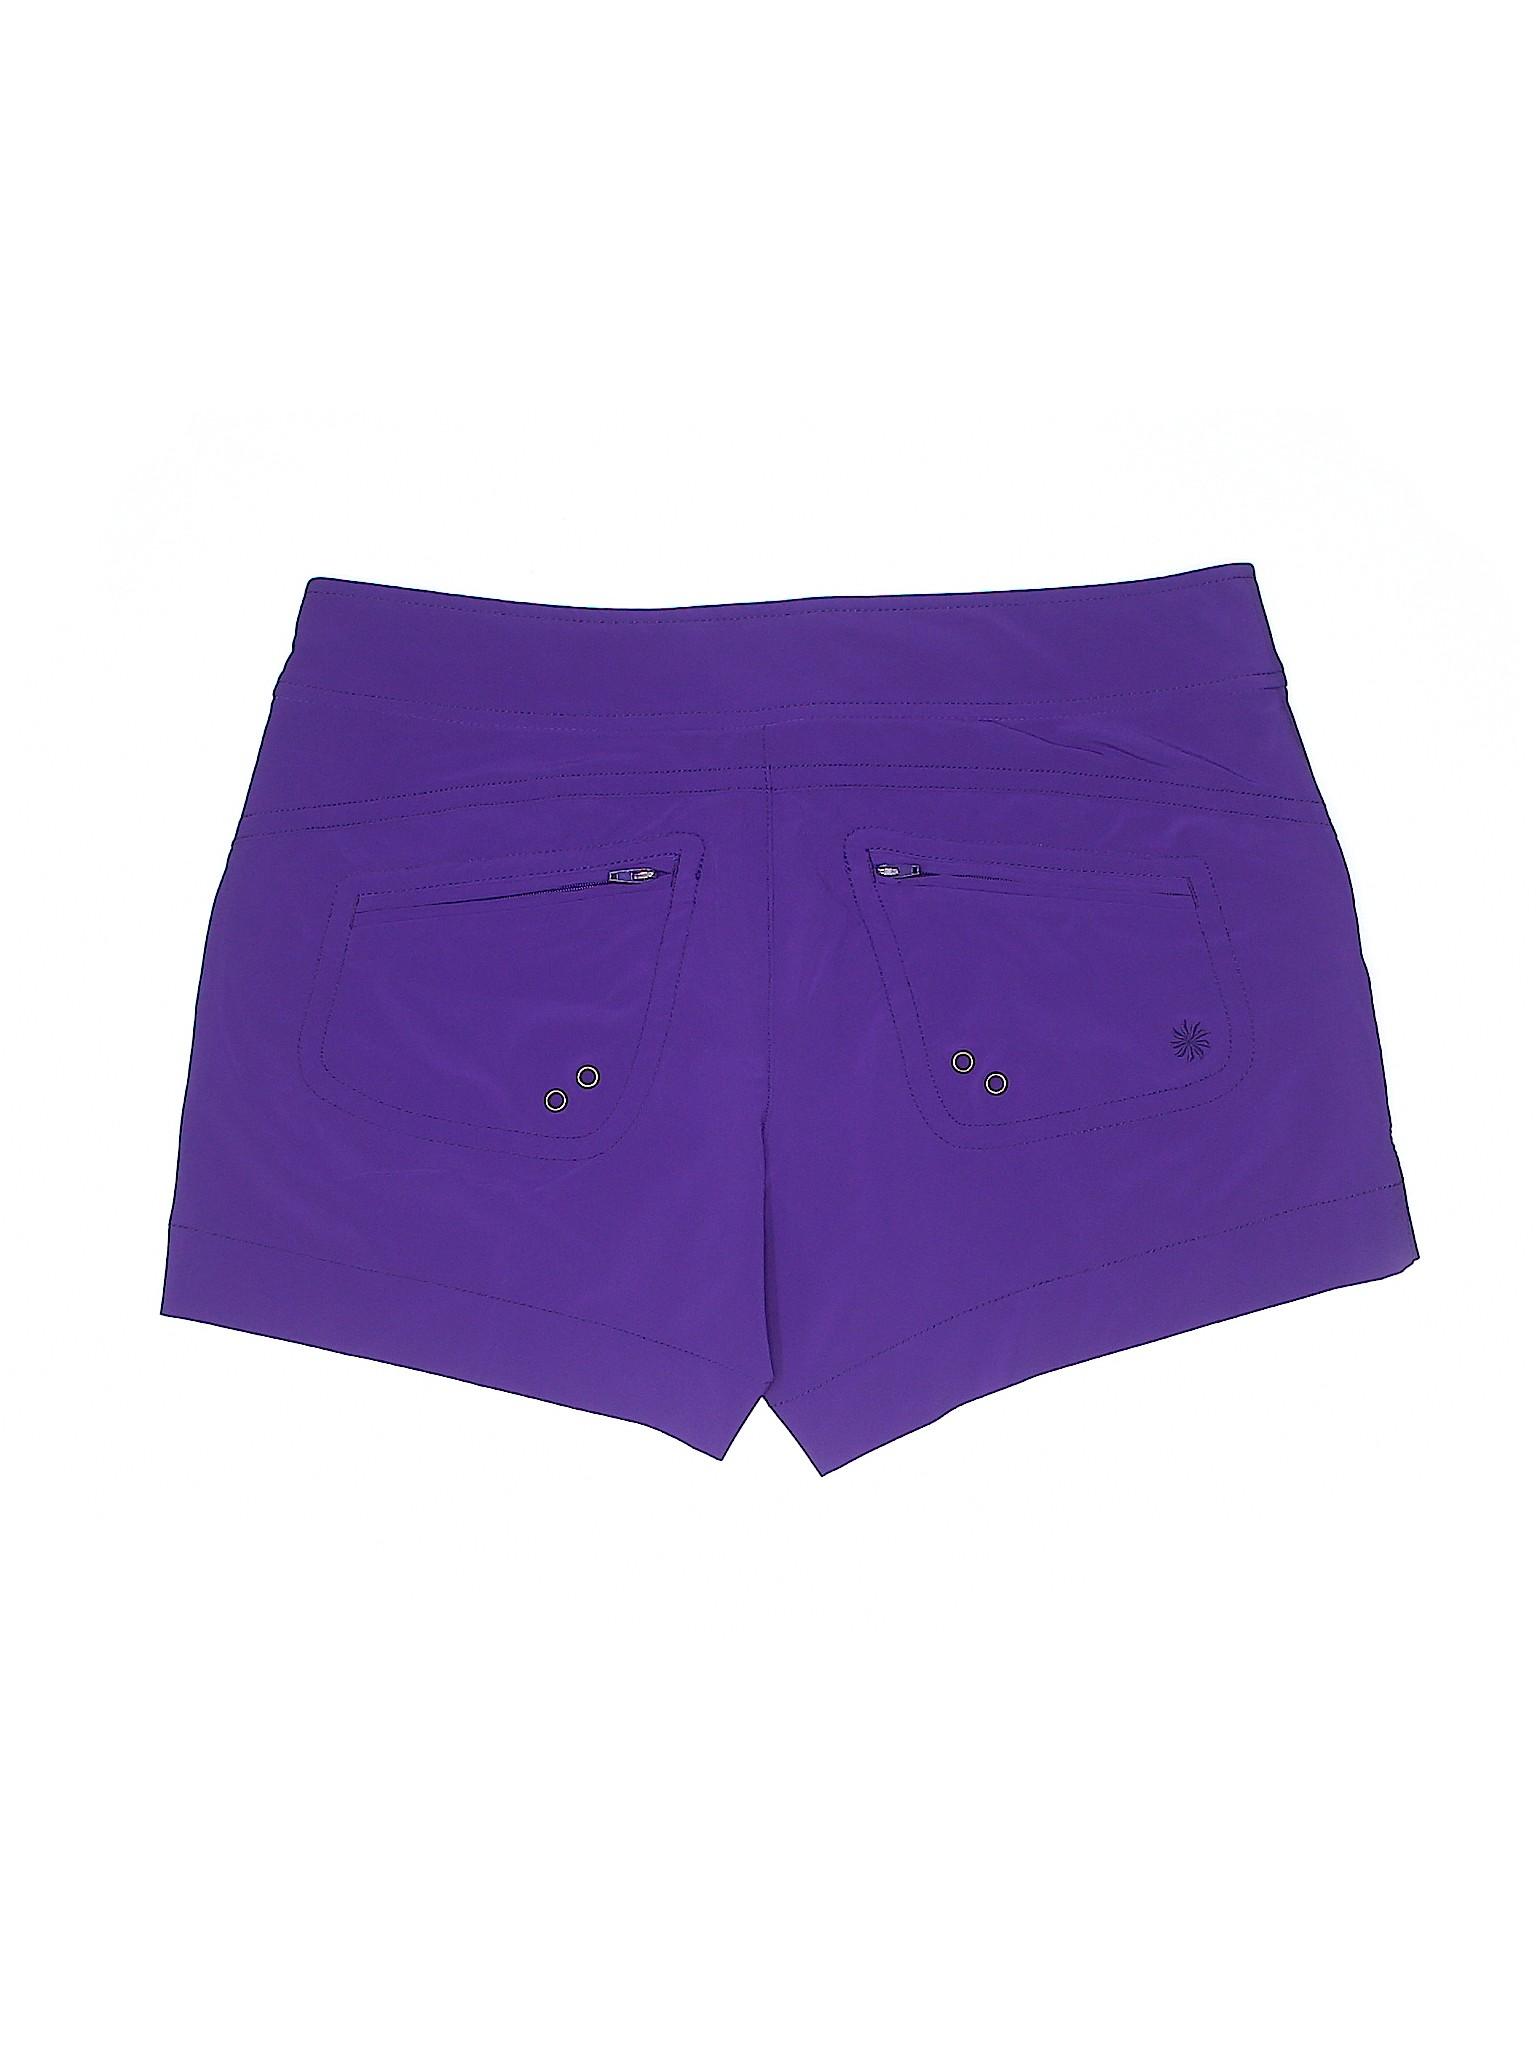 leisure leisure Boutique Athletic Athleta Athleta Shorts Boutique CqntU5n1g